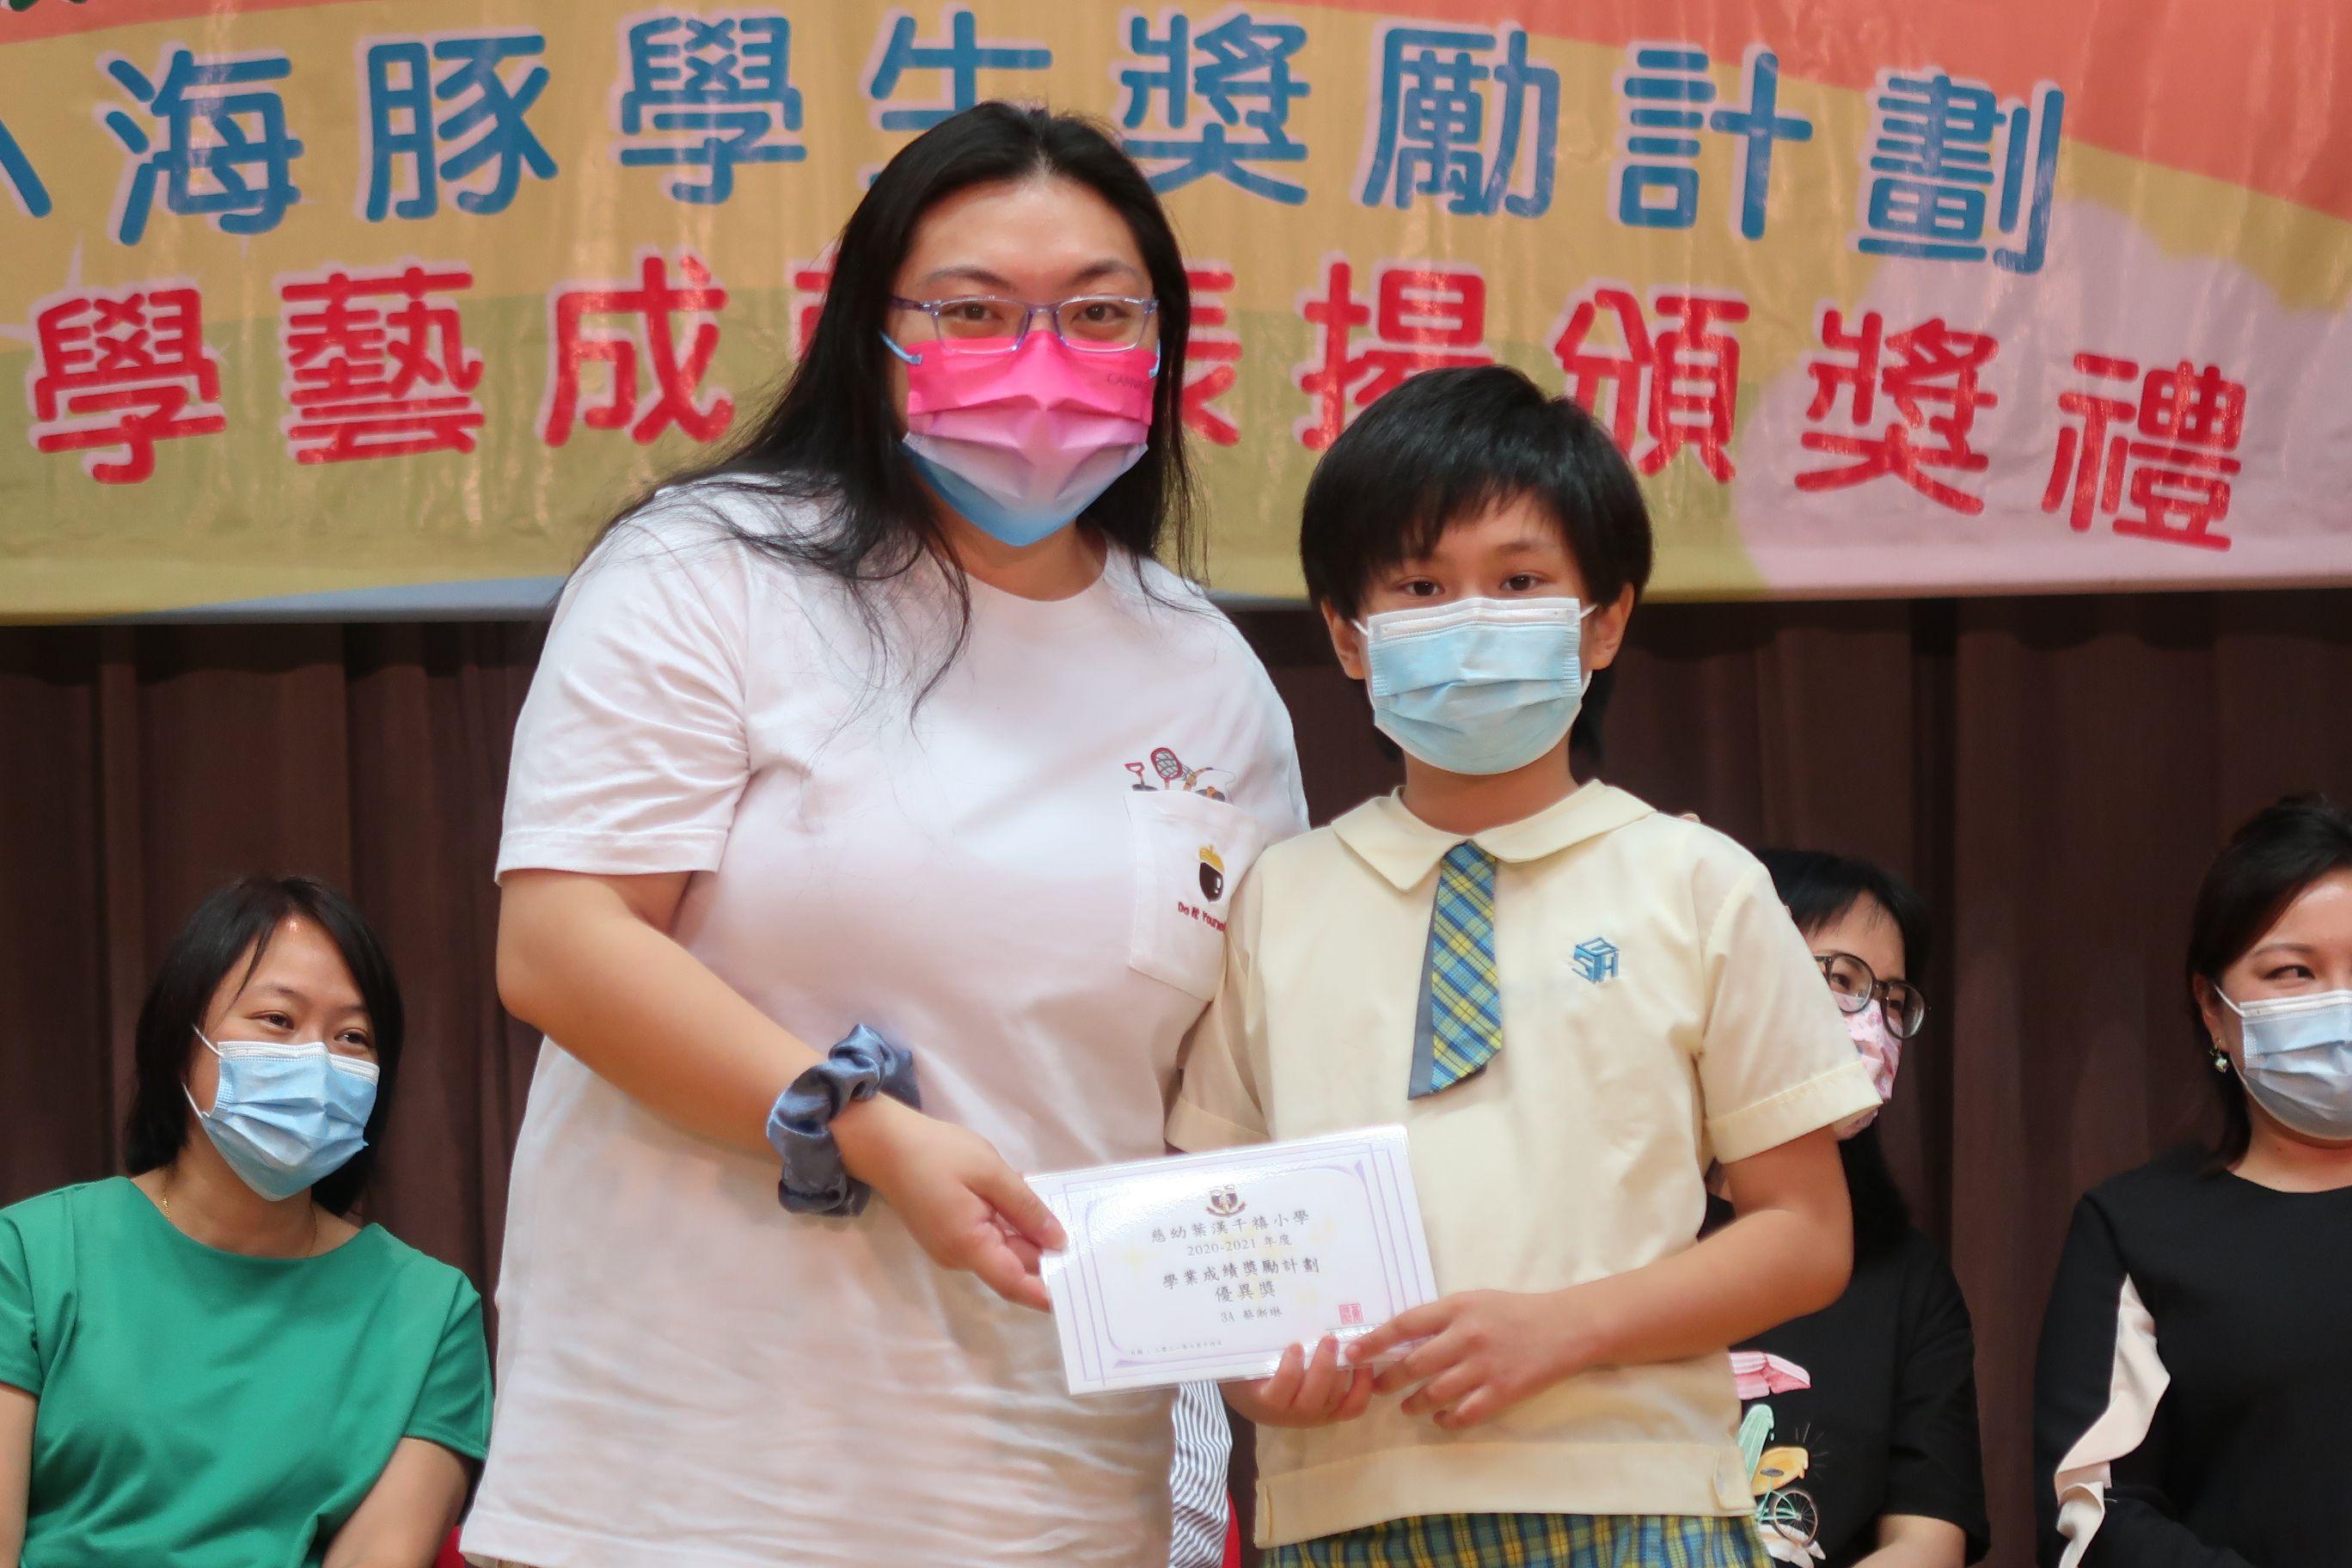 https://syh.edu.hk/sites/default/files/img_5563.jpg